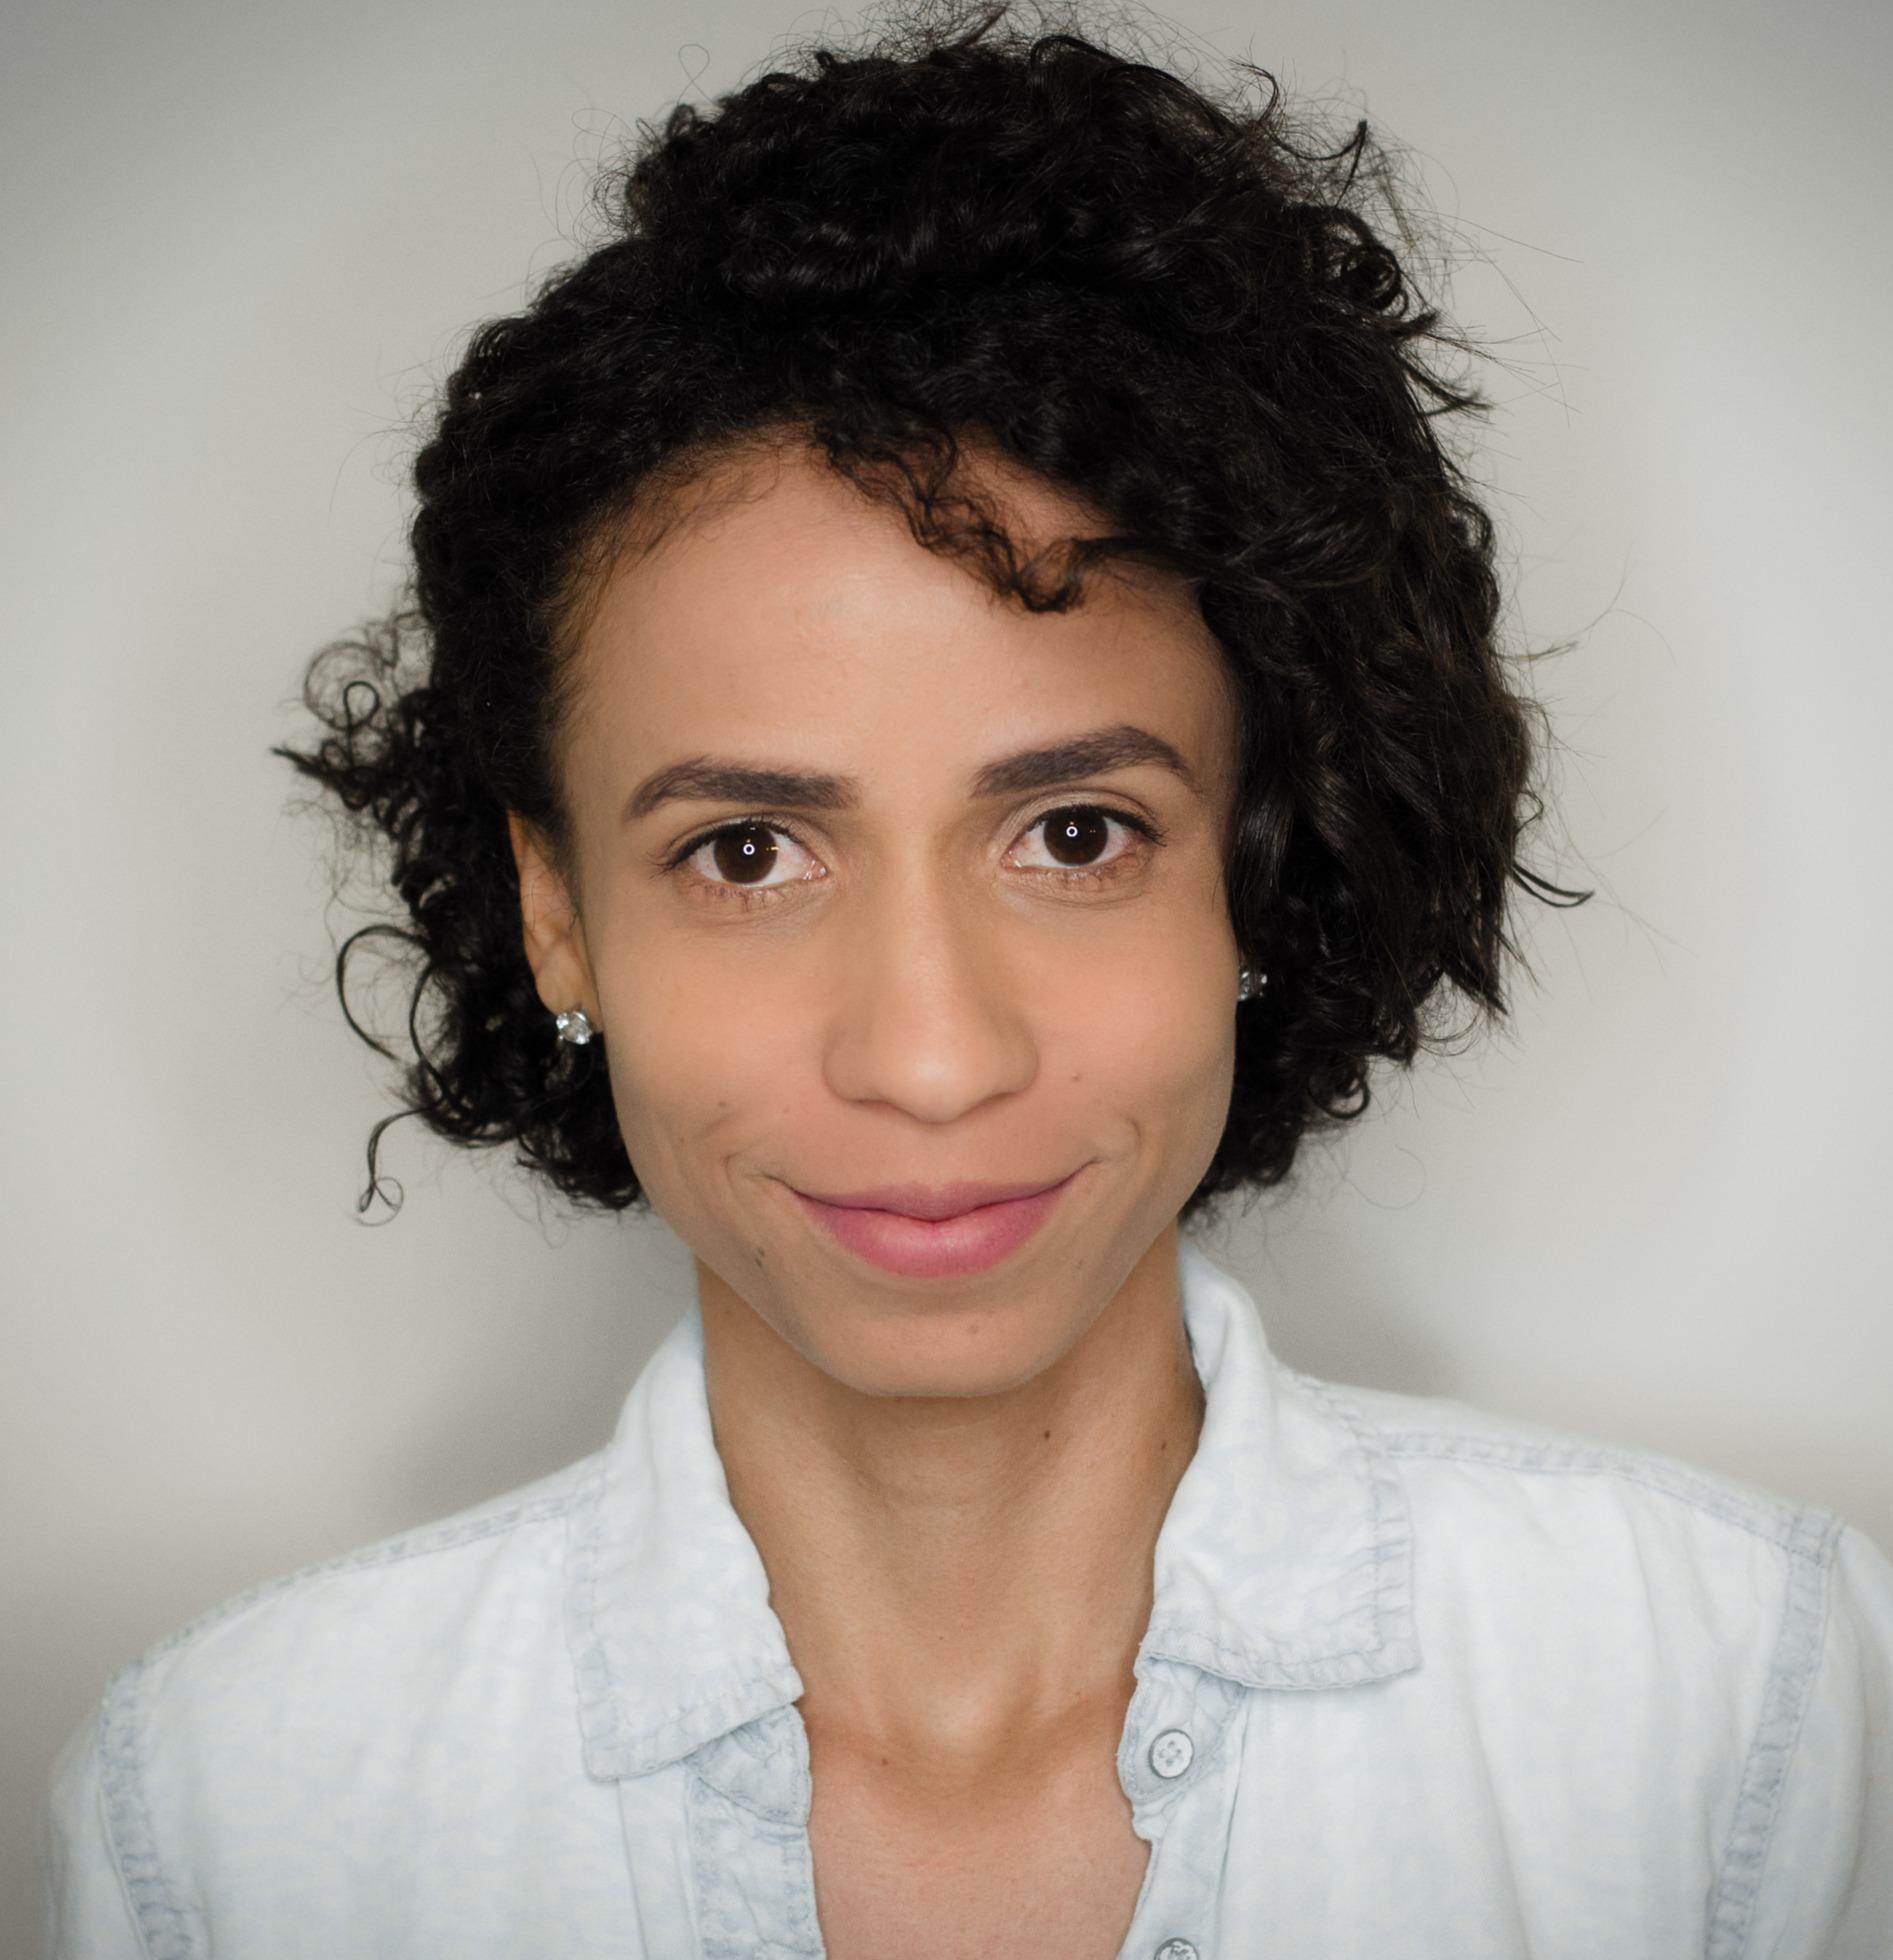 Juliana Saraiva